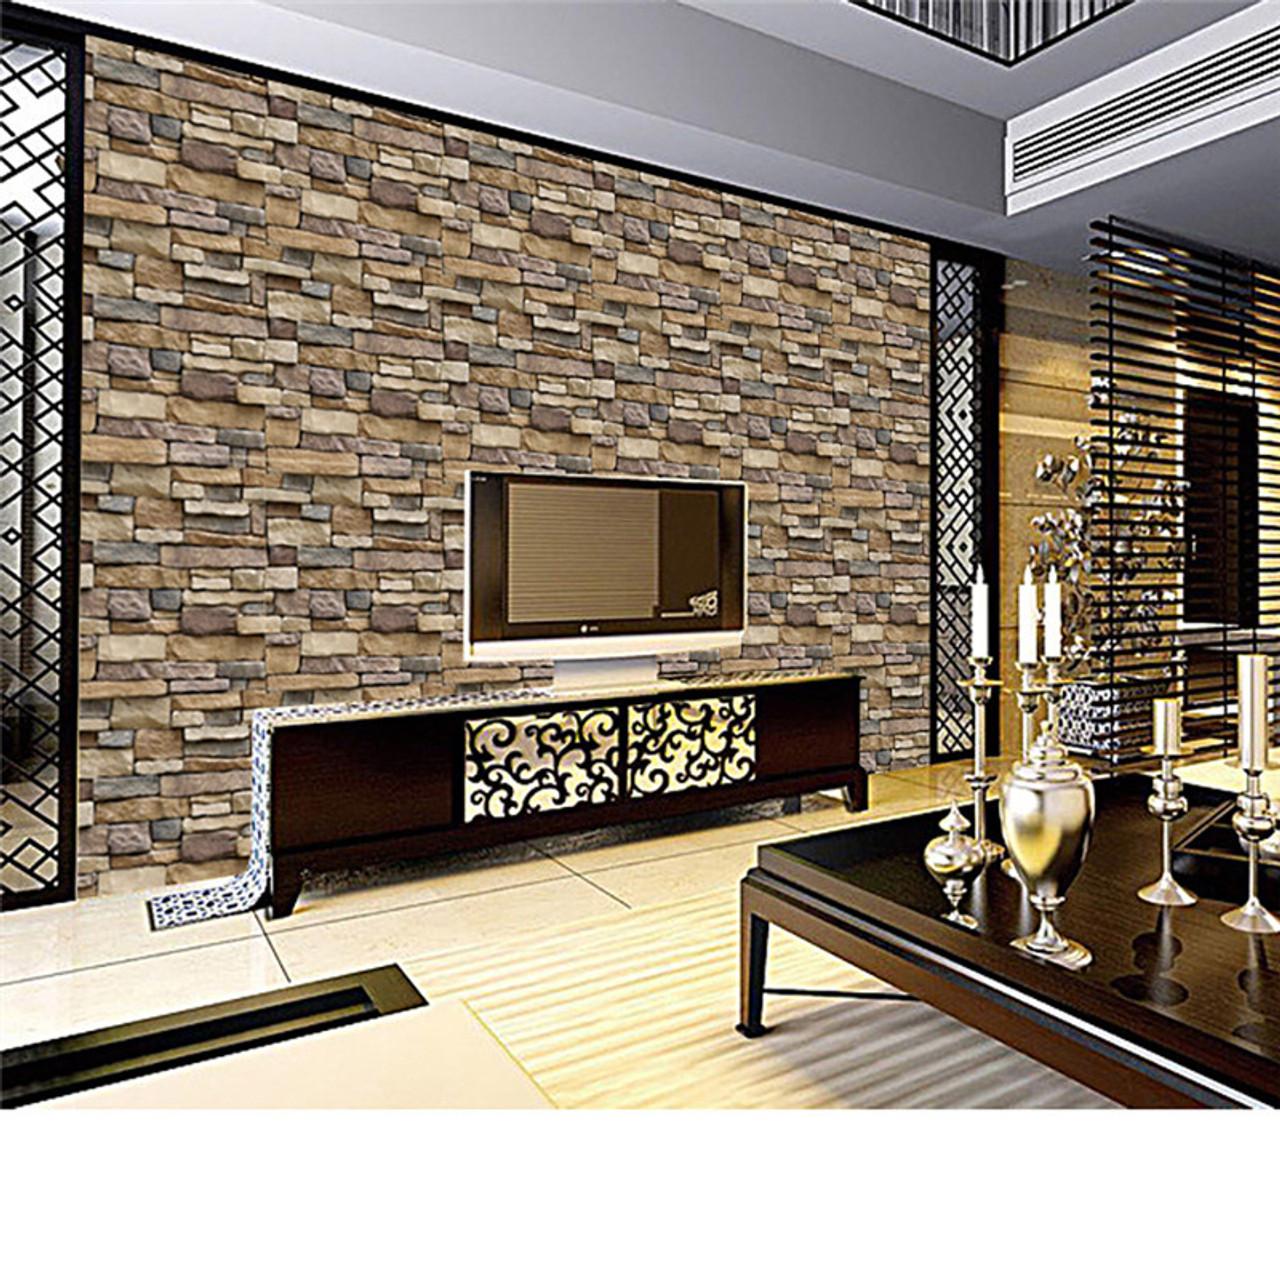 2018 3d Wall Paper Brick Stone Rustic Effect Self Adhesive Wall